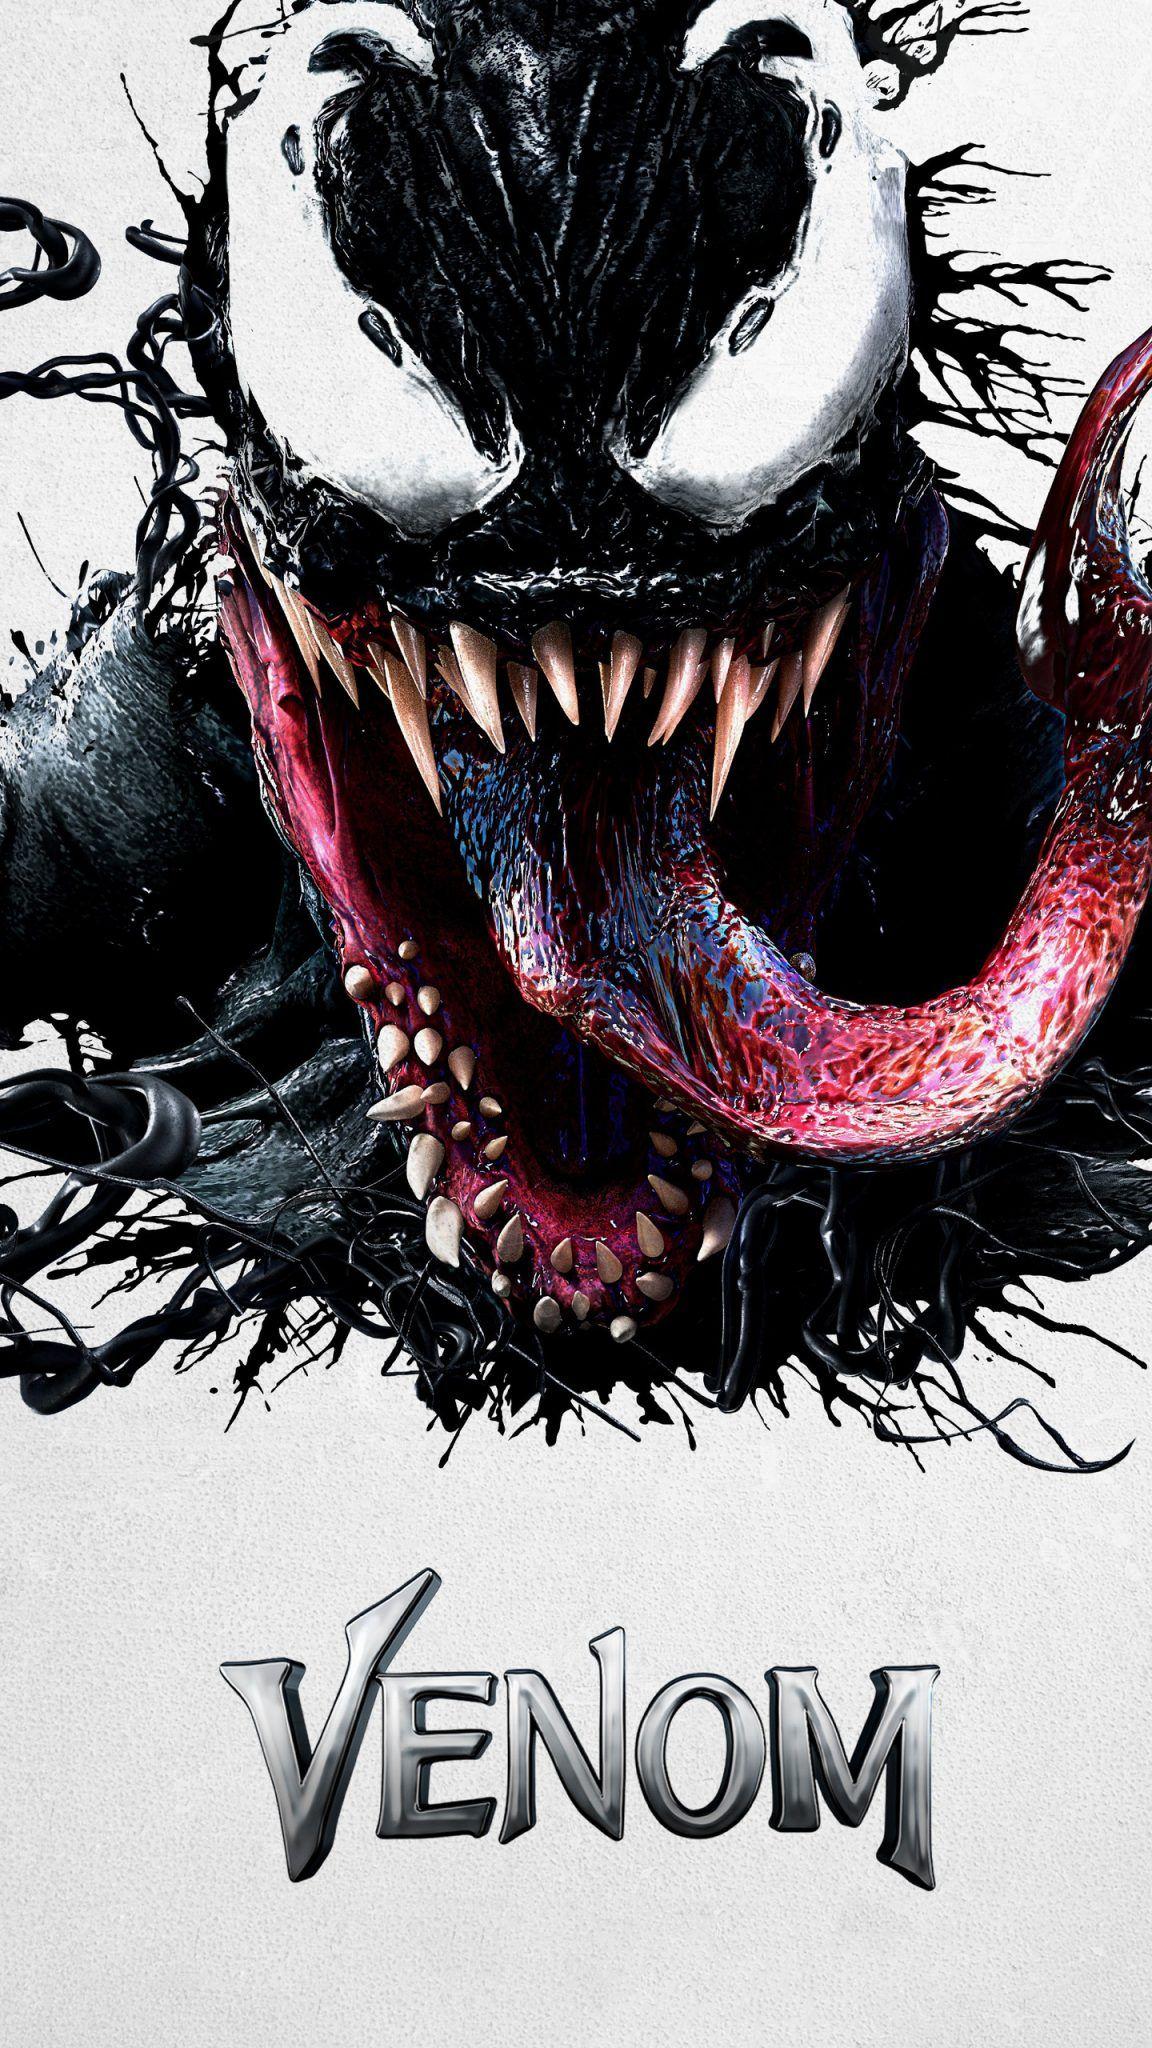 Top Venom Wallpapers For Your Pinterest Boards  Venom